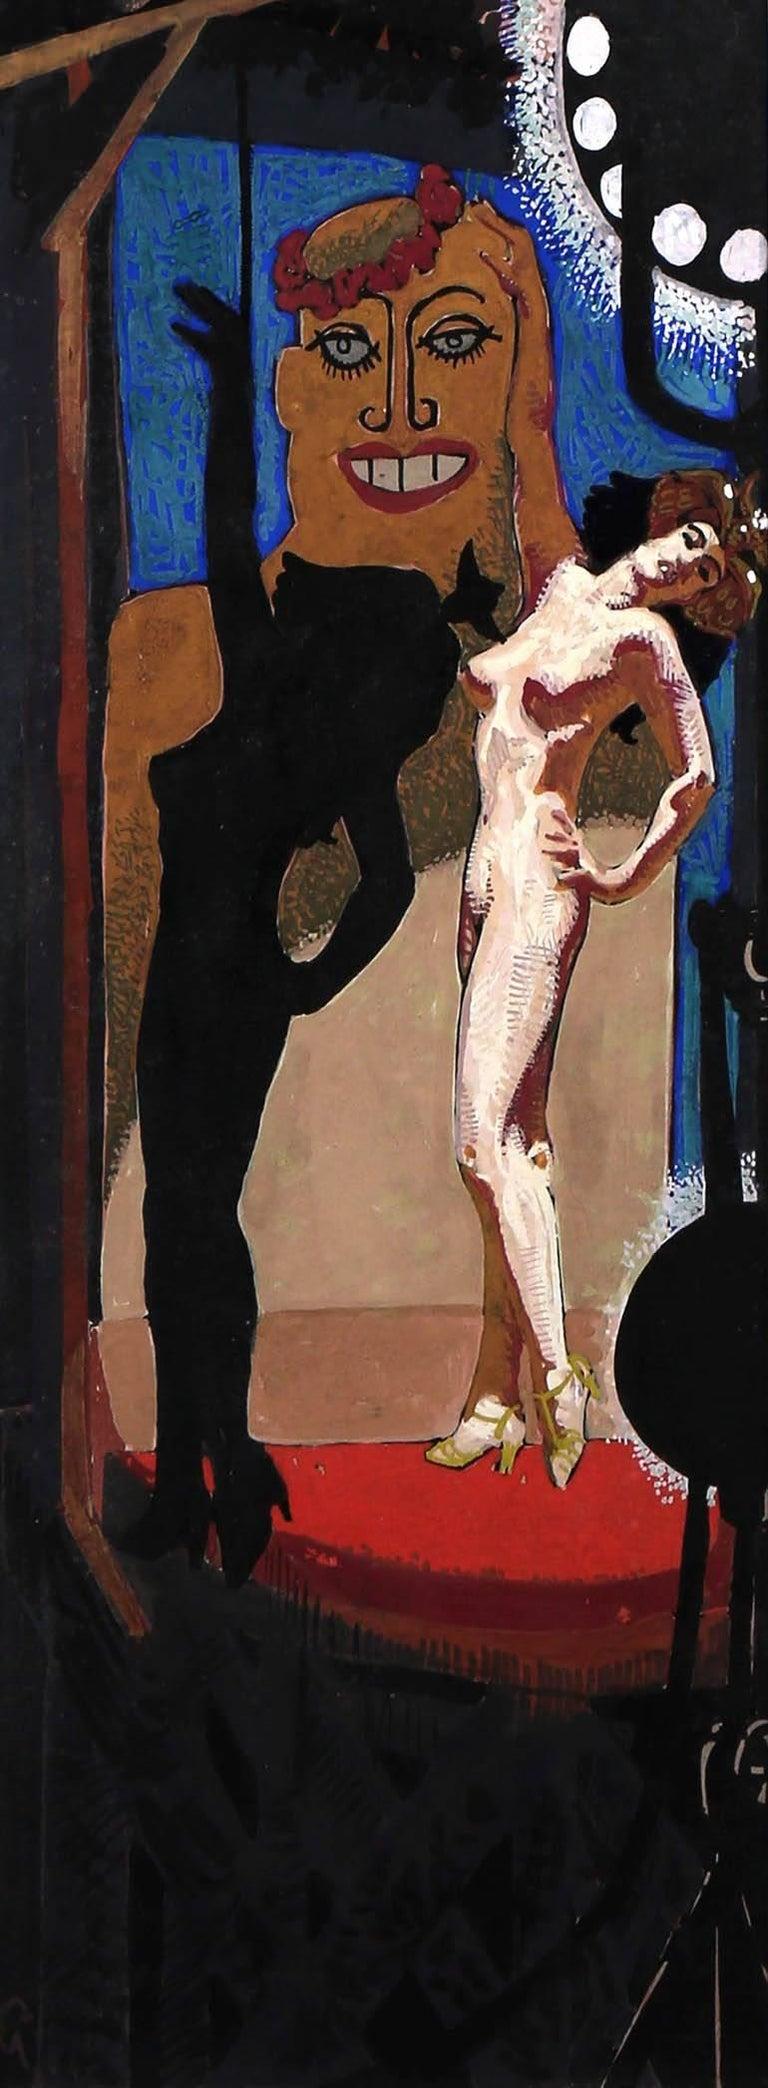 Mahlon Blaine Figurative Painting - The Sad Burlesque